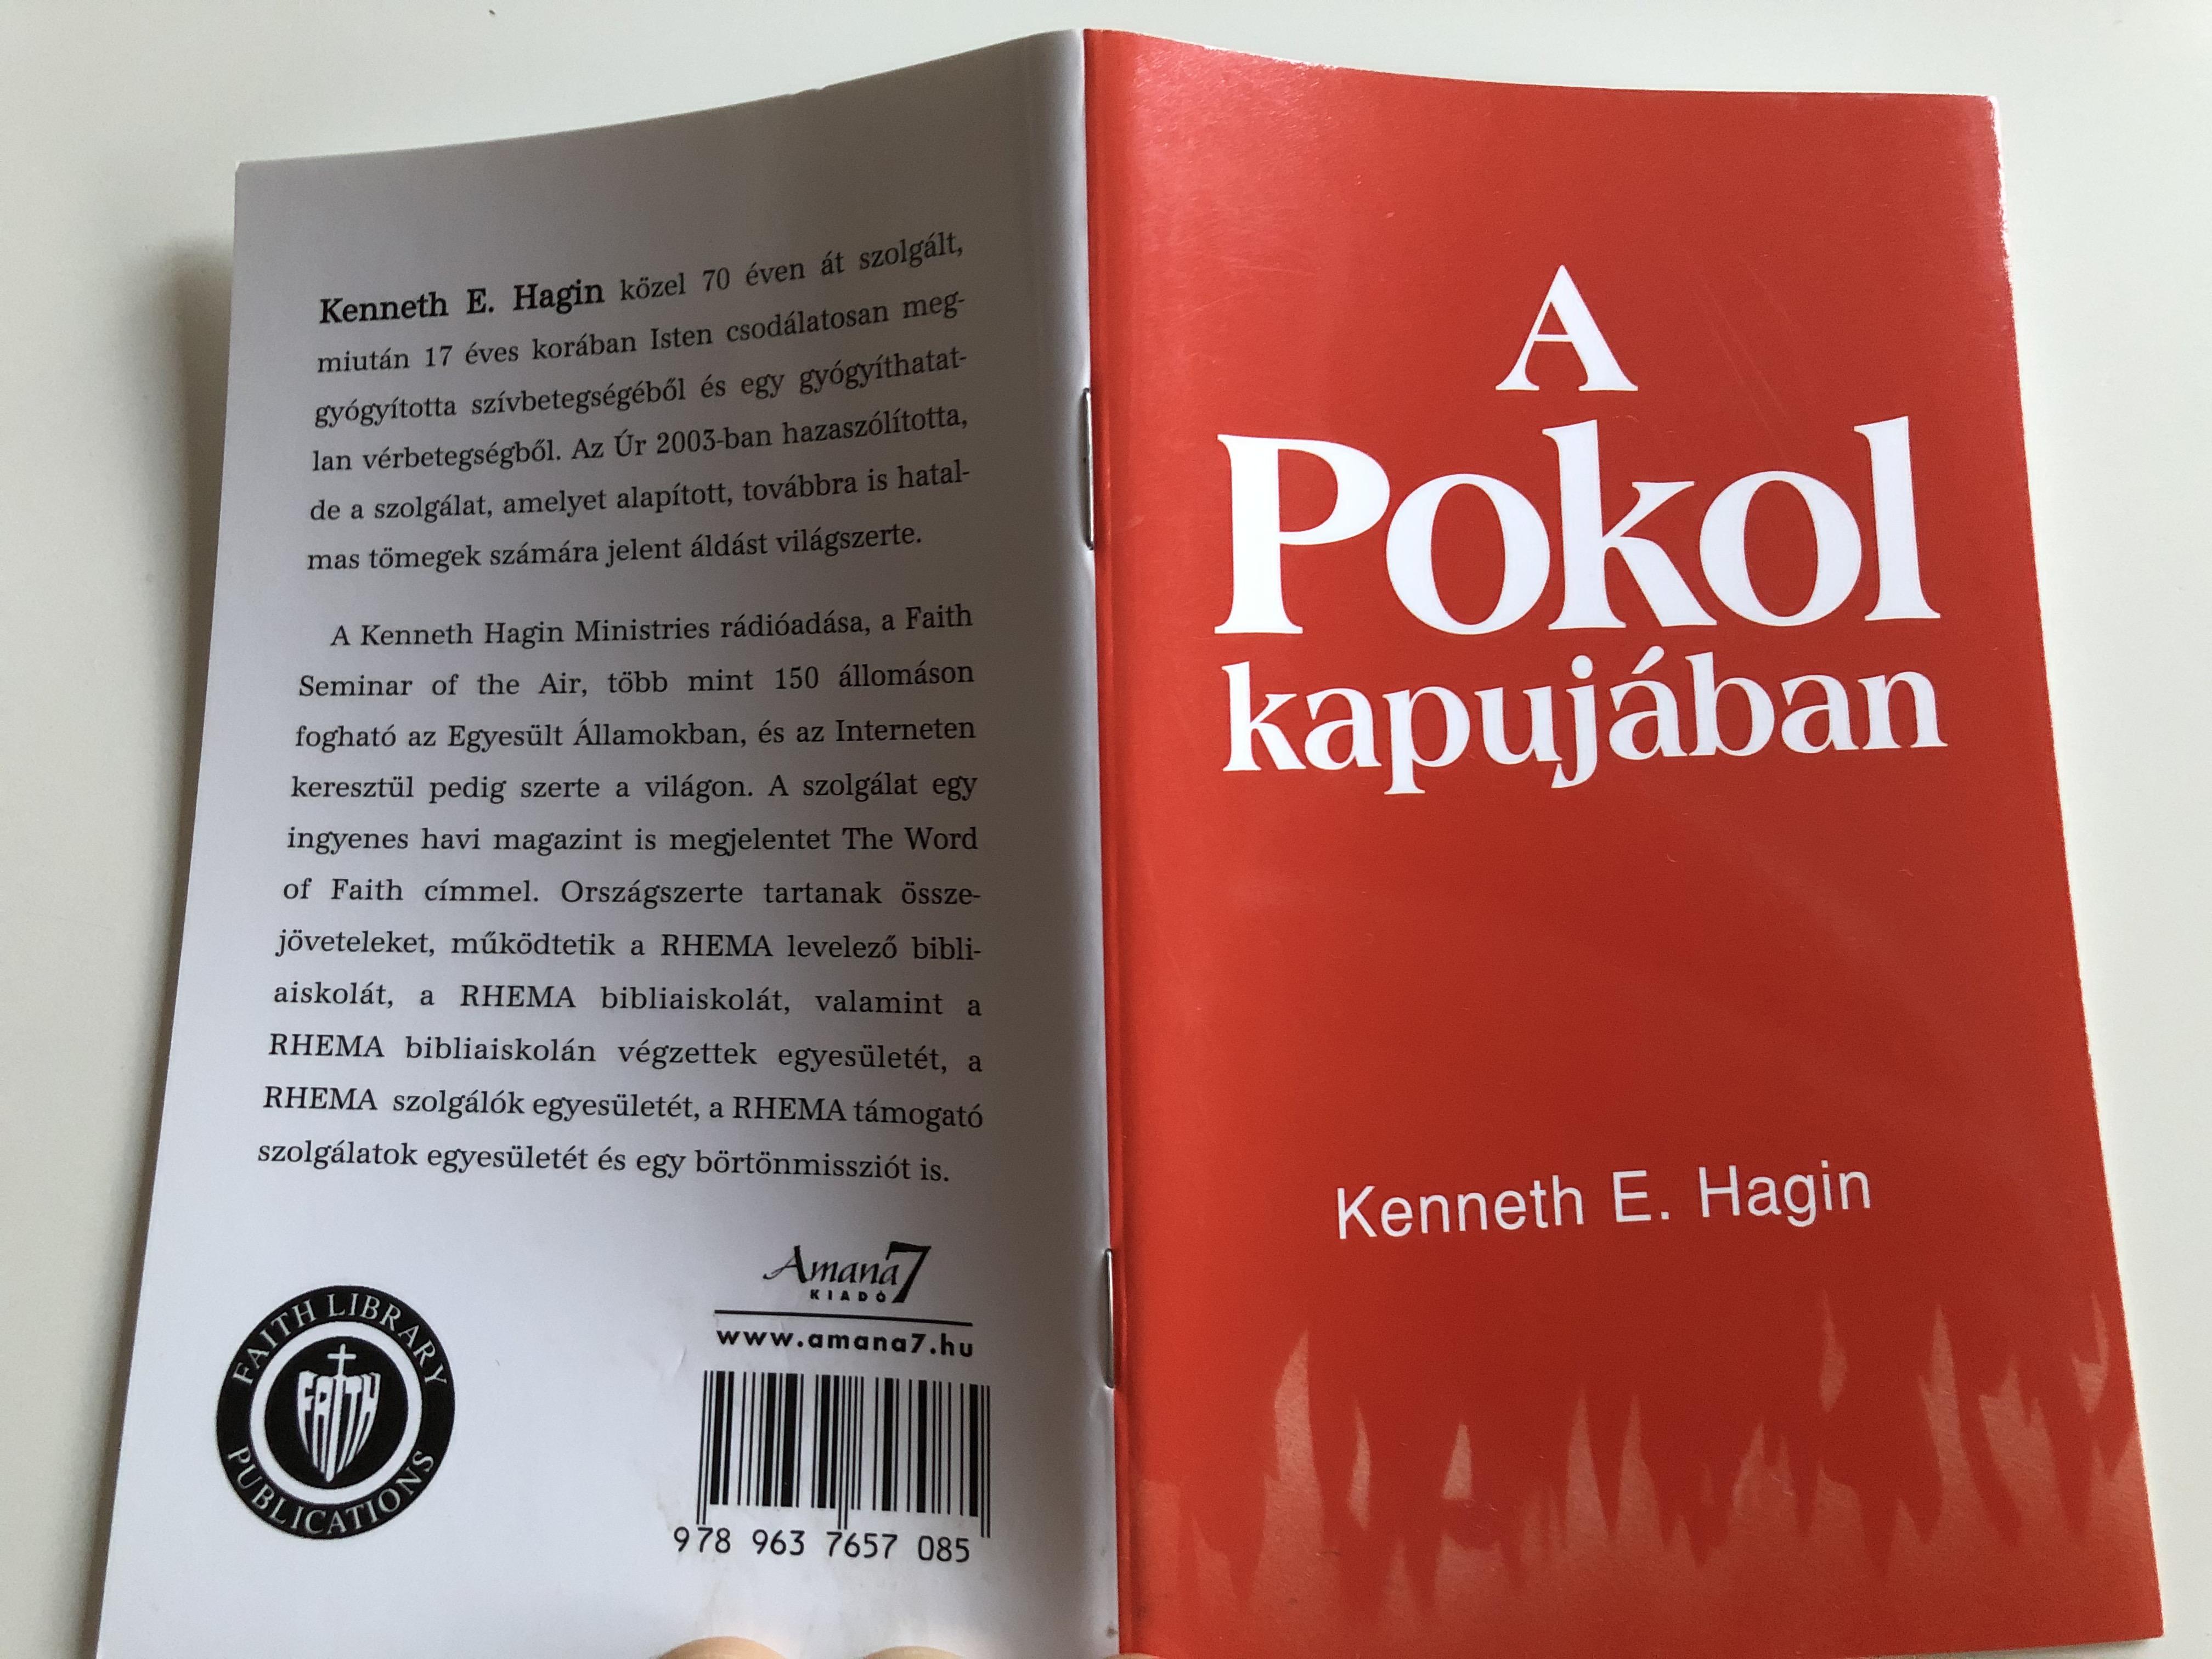 a-pokol-kapuj-ban-by-kenneth-e.-hagin-hungarian-edition-of-hell-9-.jpg